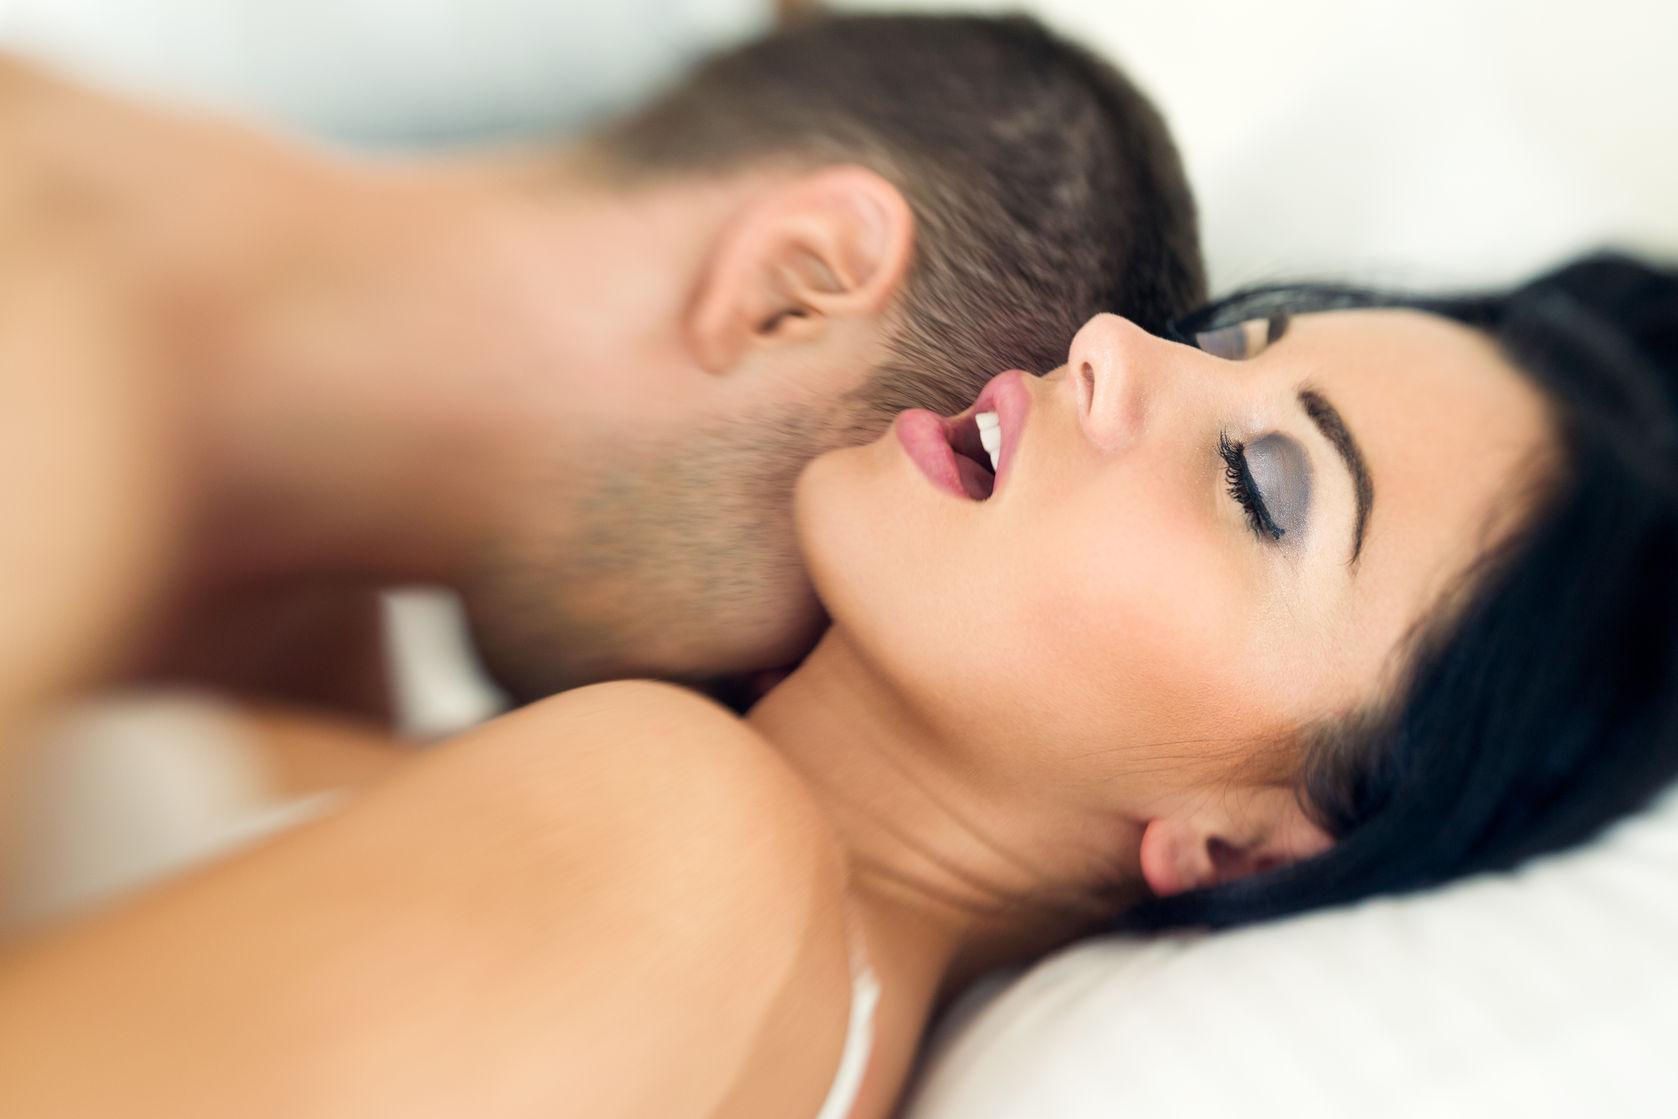 Sex why women scream during 12 Awkward